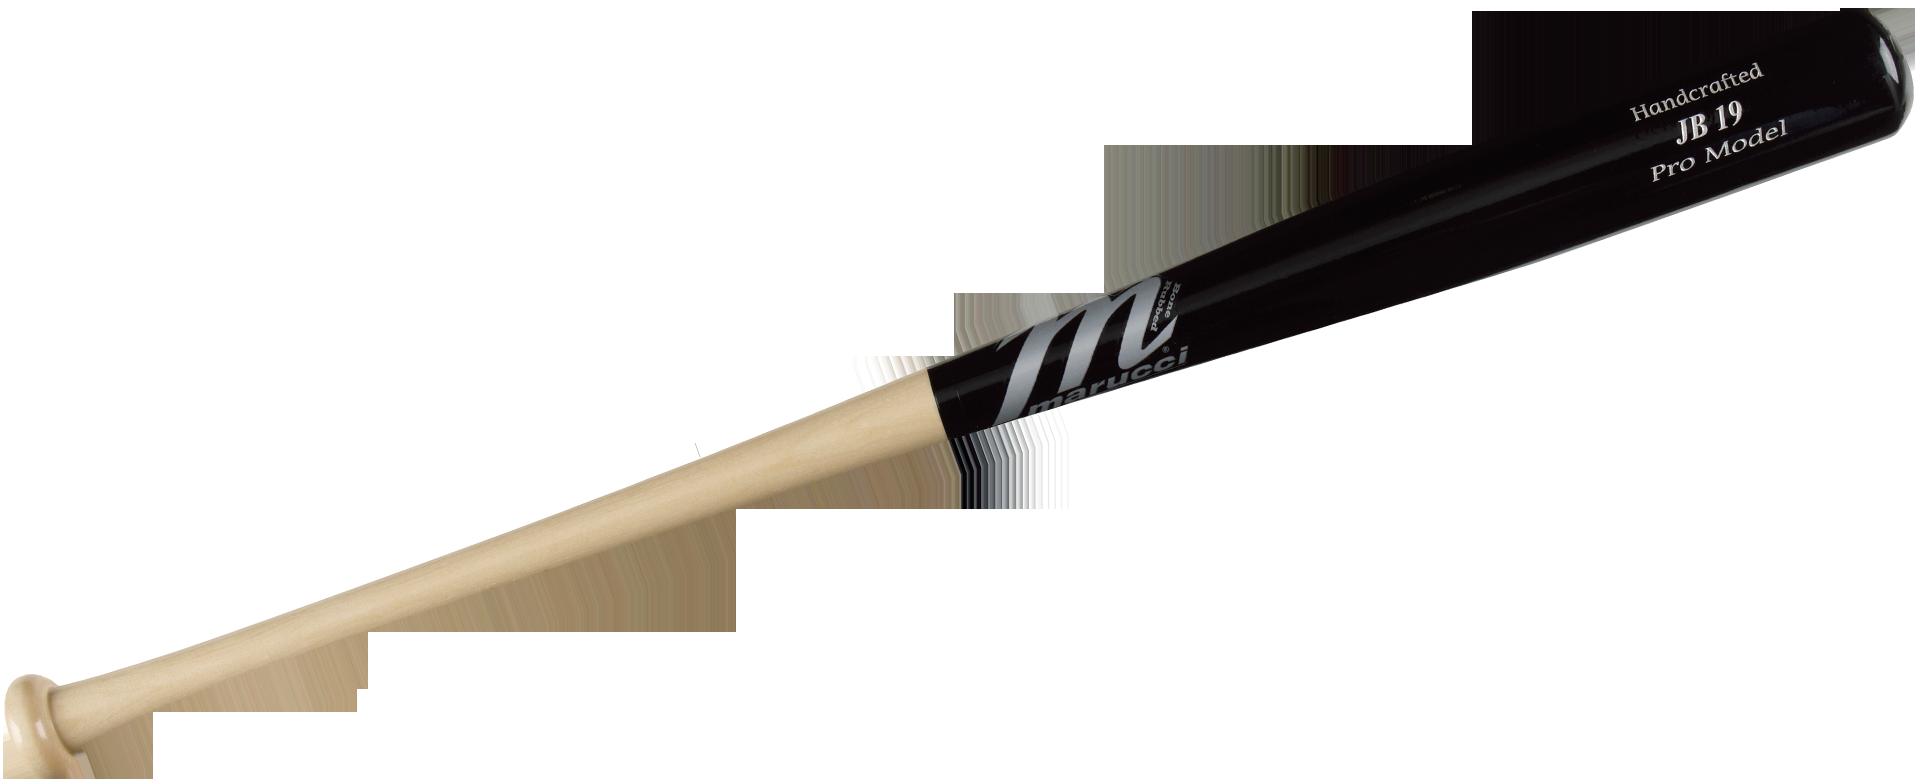 Baseball Bat Png Image Baseball Bat Baseball Diamond Baseball